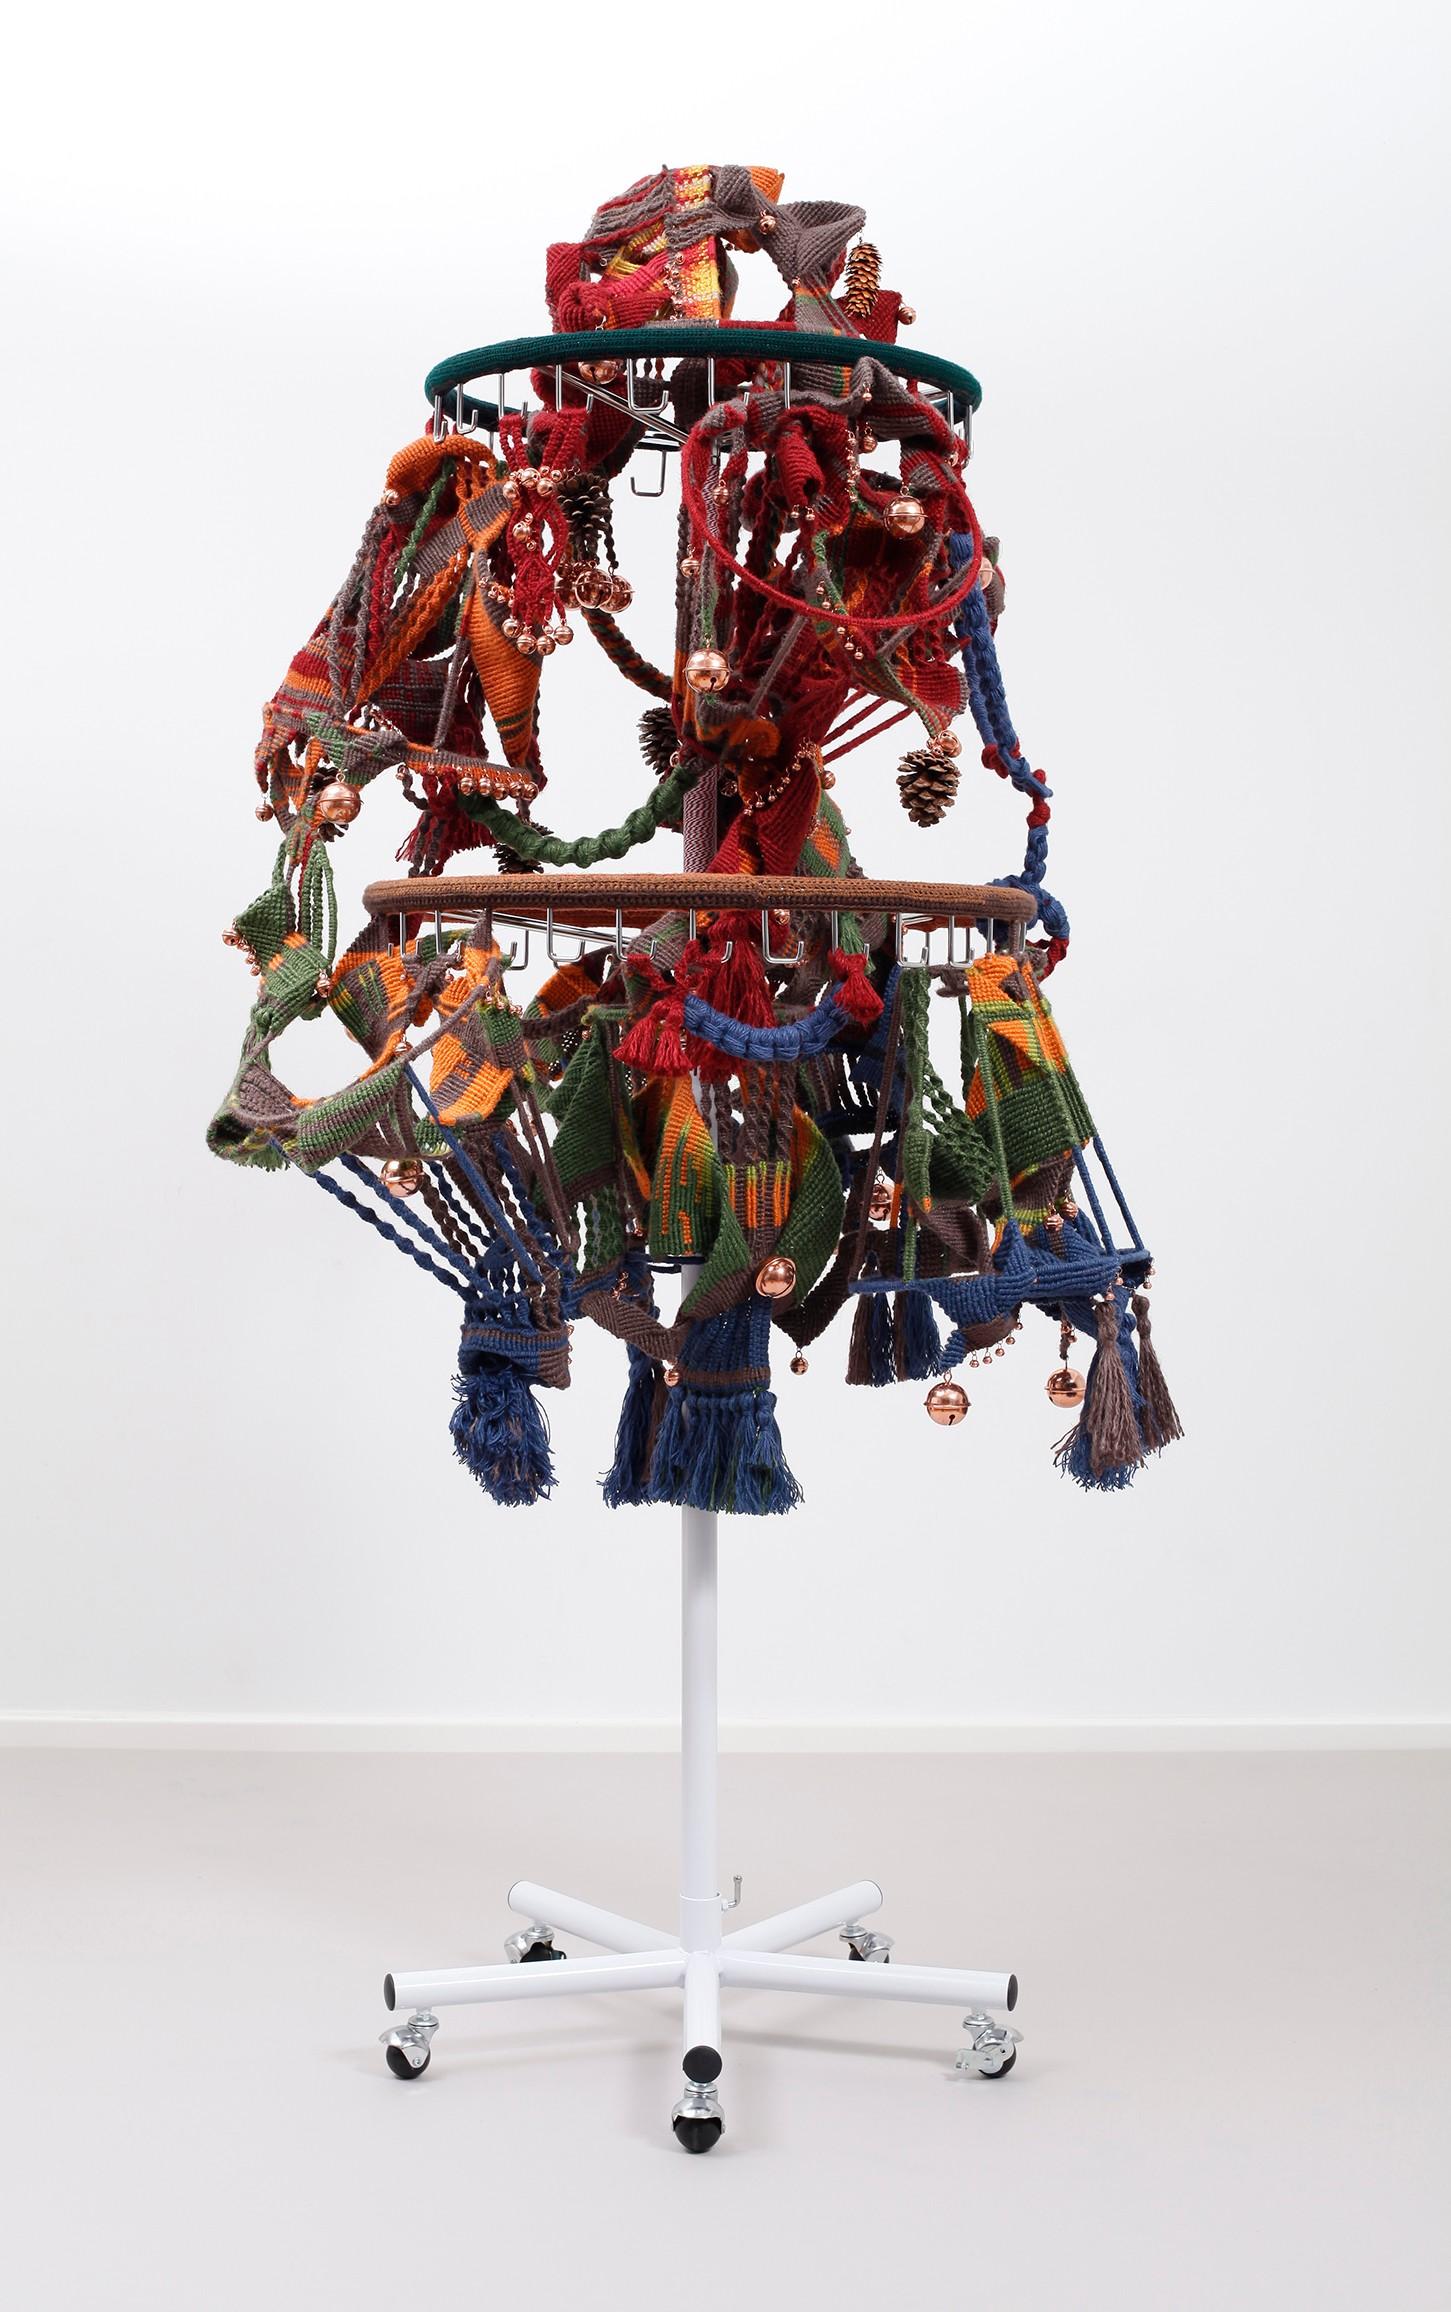 Best Galleries to Explore at Art Basel Miami 2018 Chantal Crousel - Haegue Yang Chantal Crousel Best Galleries to Explore at Art Basel Miami 2018: Chantal Crousel Best Galleries to Explore at Art Basel Miami 2018 Haegue Yang